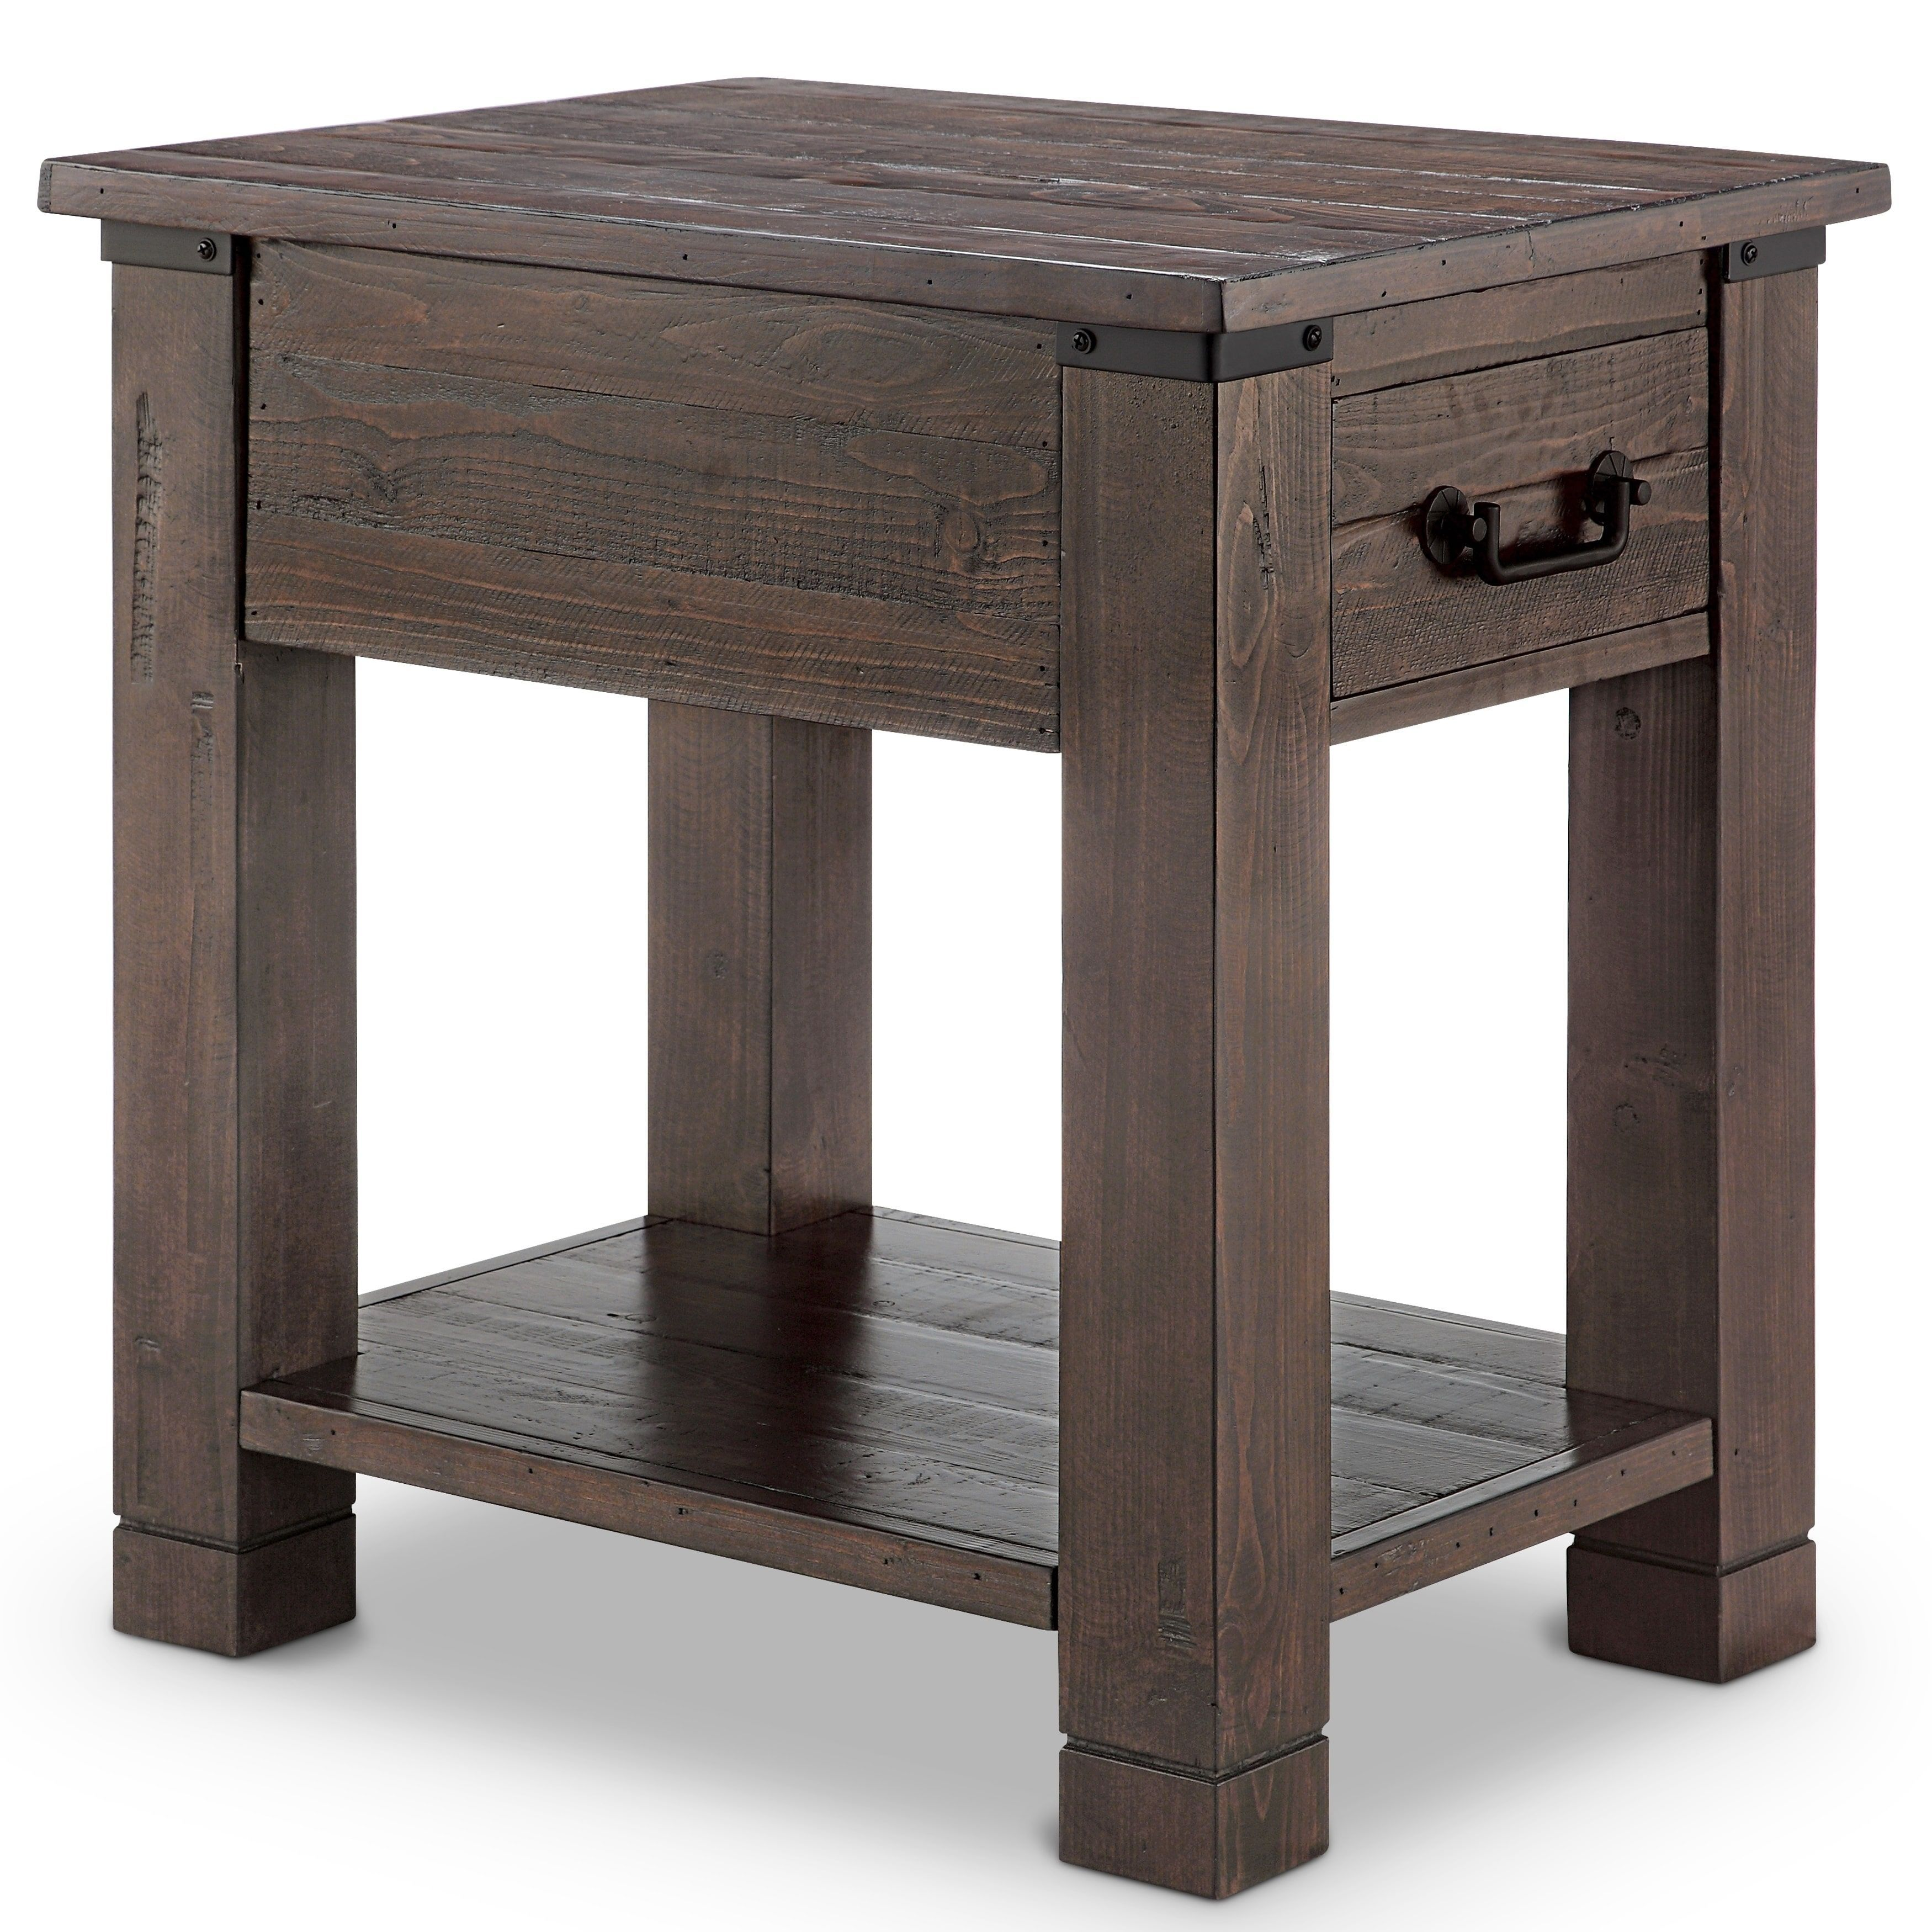 Magnussen Home Furnishings Pine Hill Wood Metal Rustic Rectangular End Table Brown